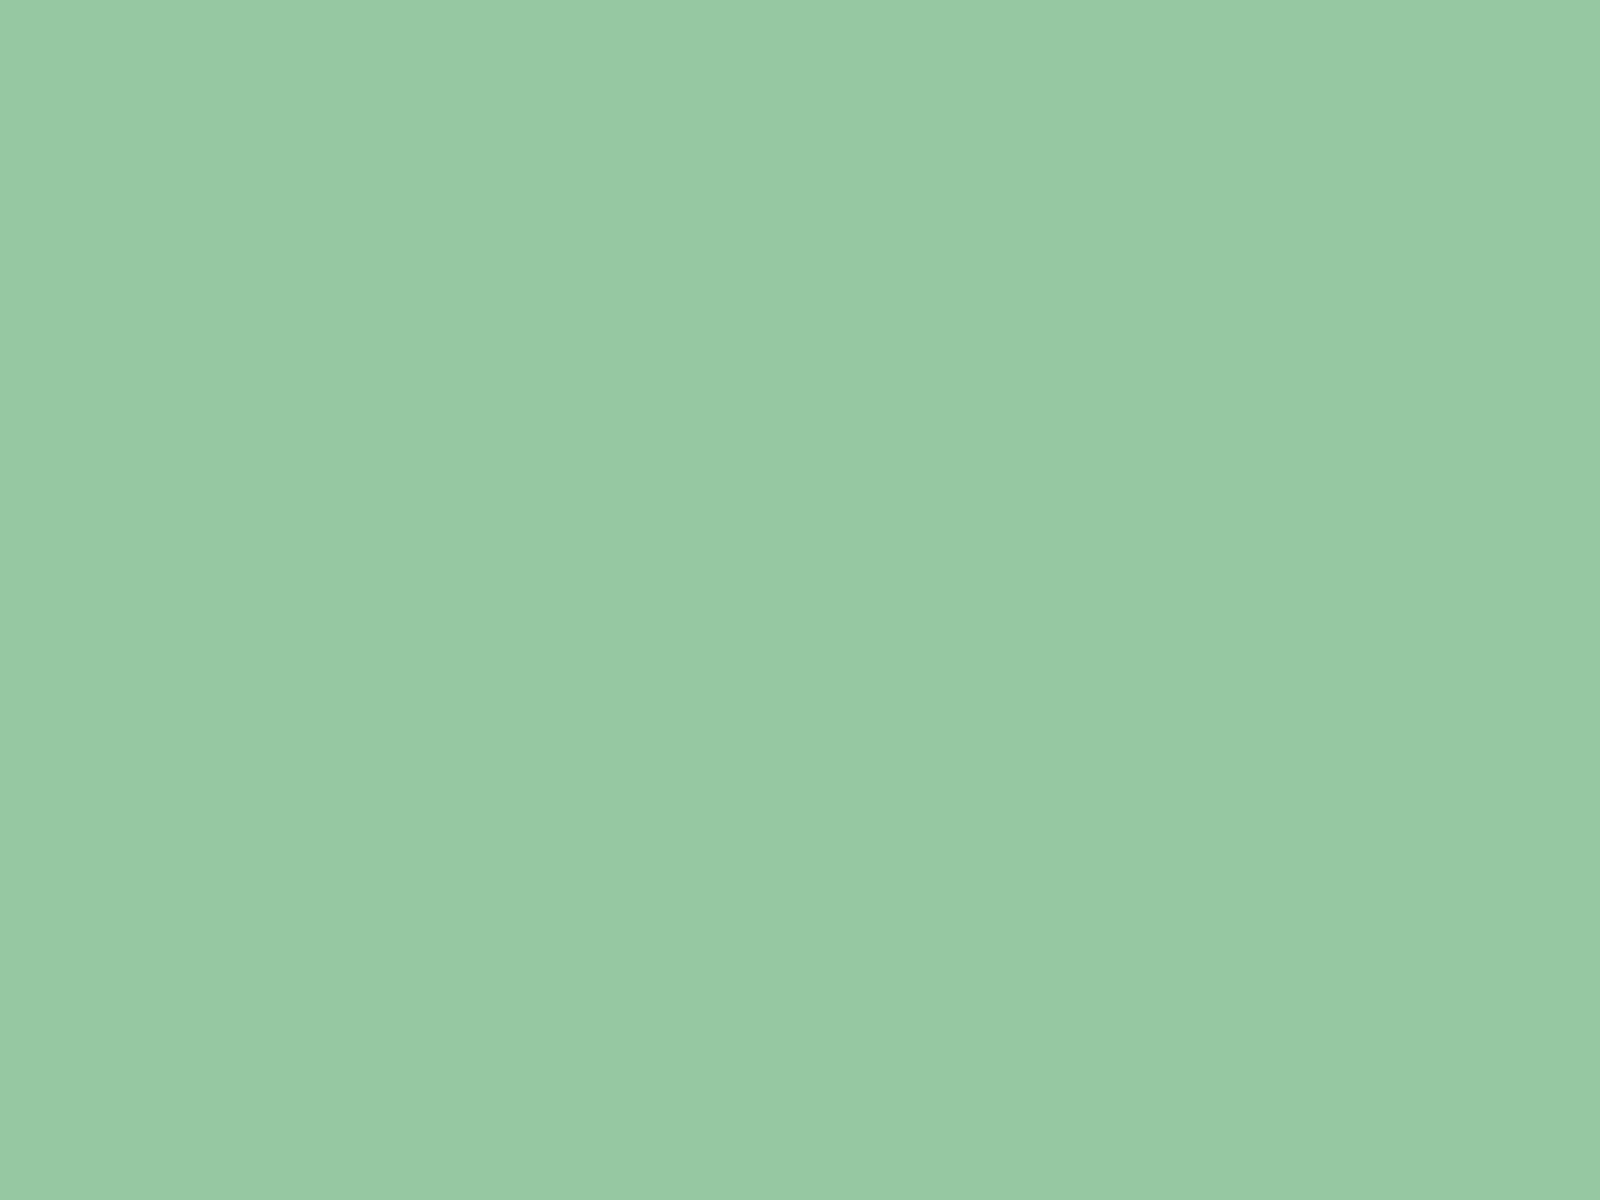 1600x1200 Eton Blue Solid Color Background